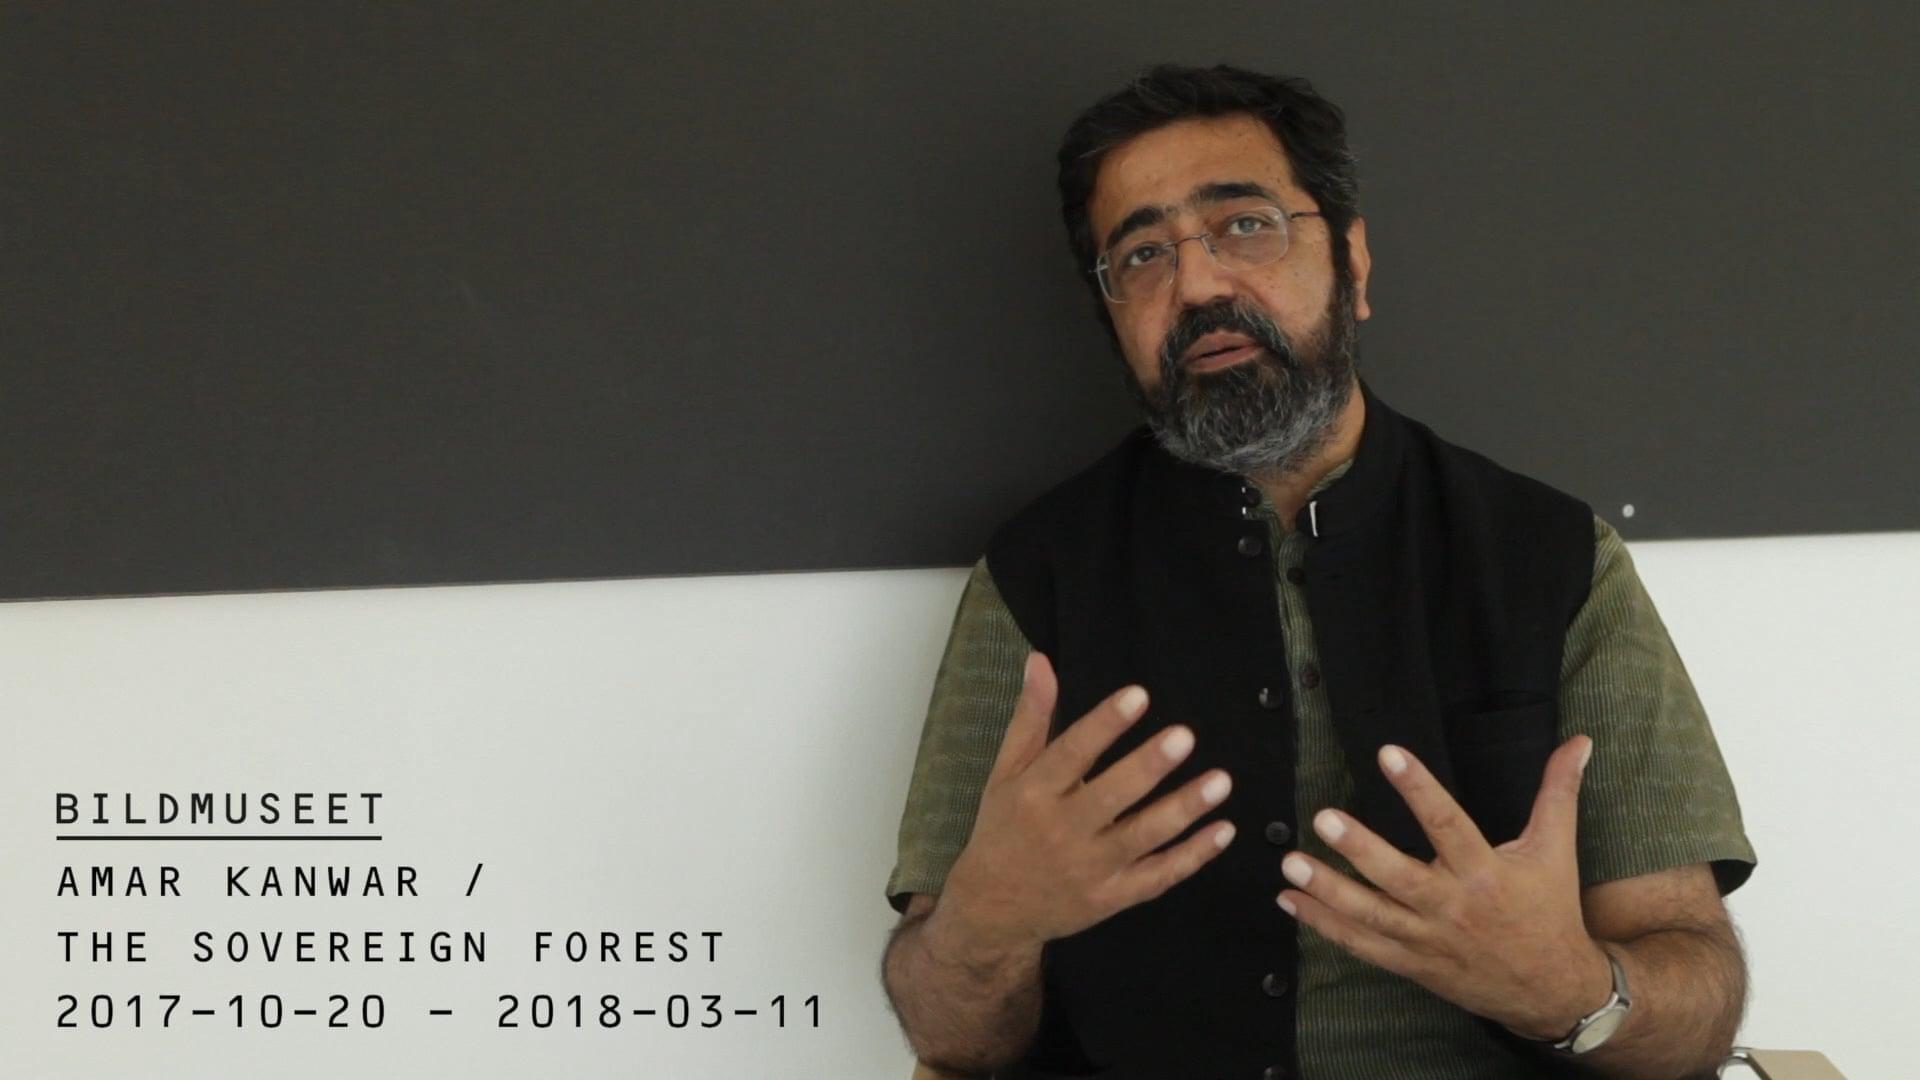 Film: Amar Kanwar